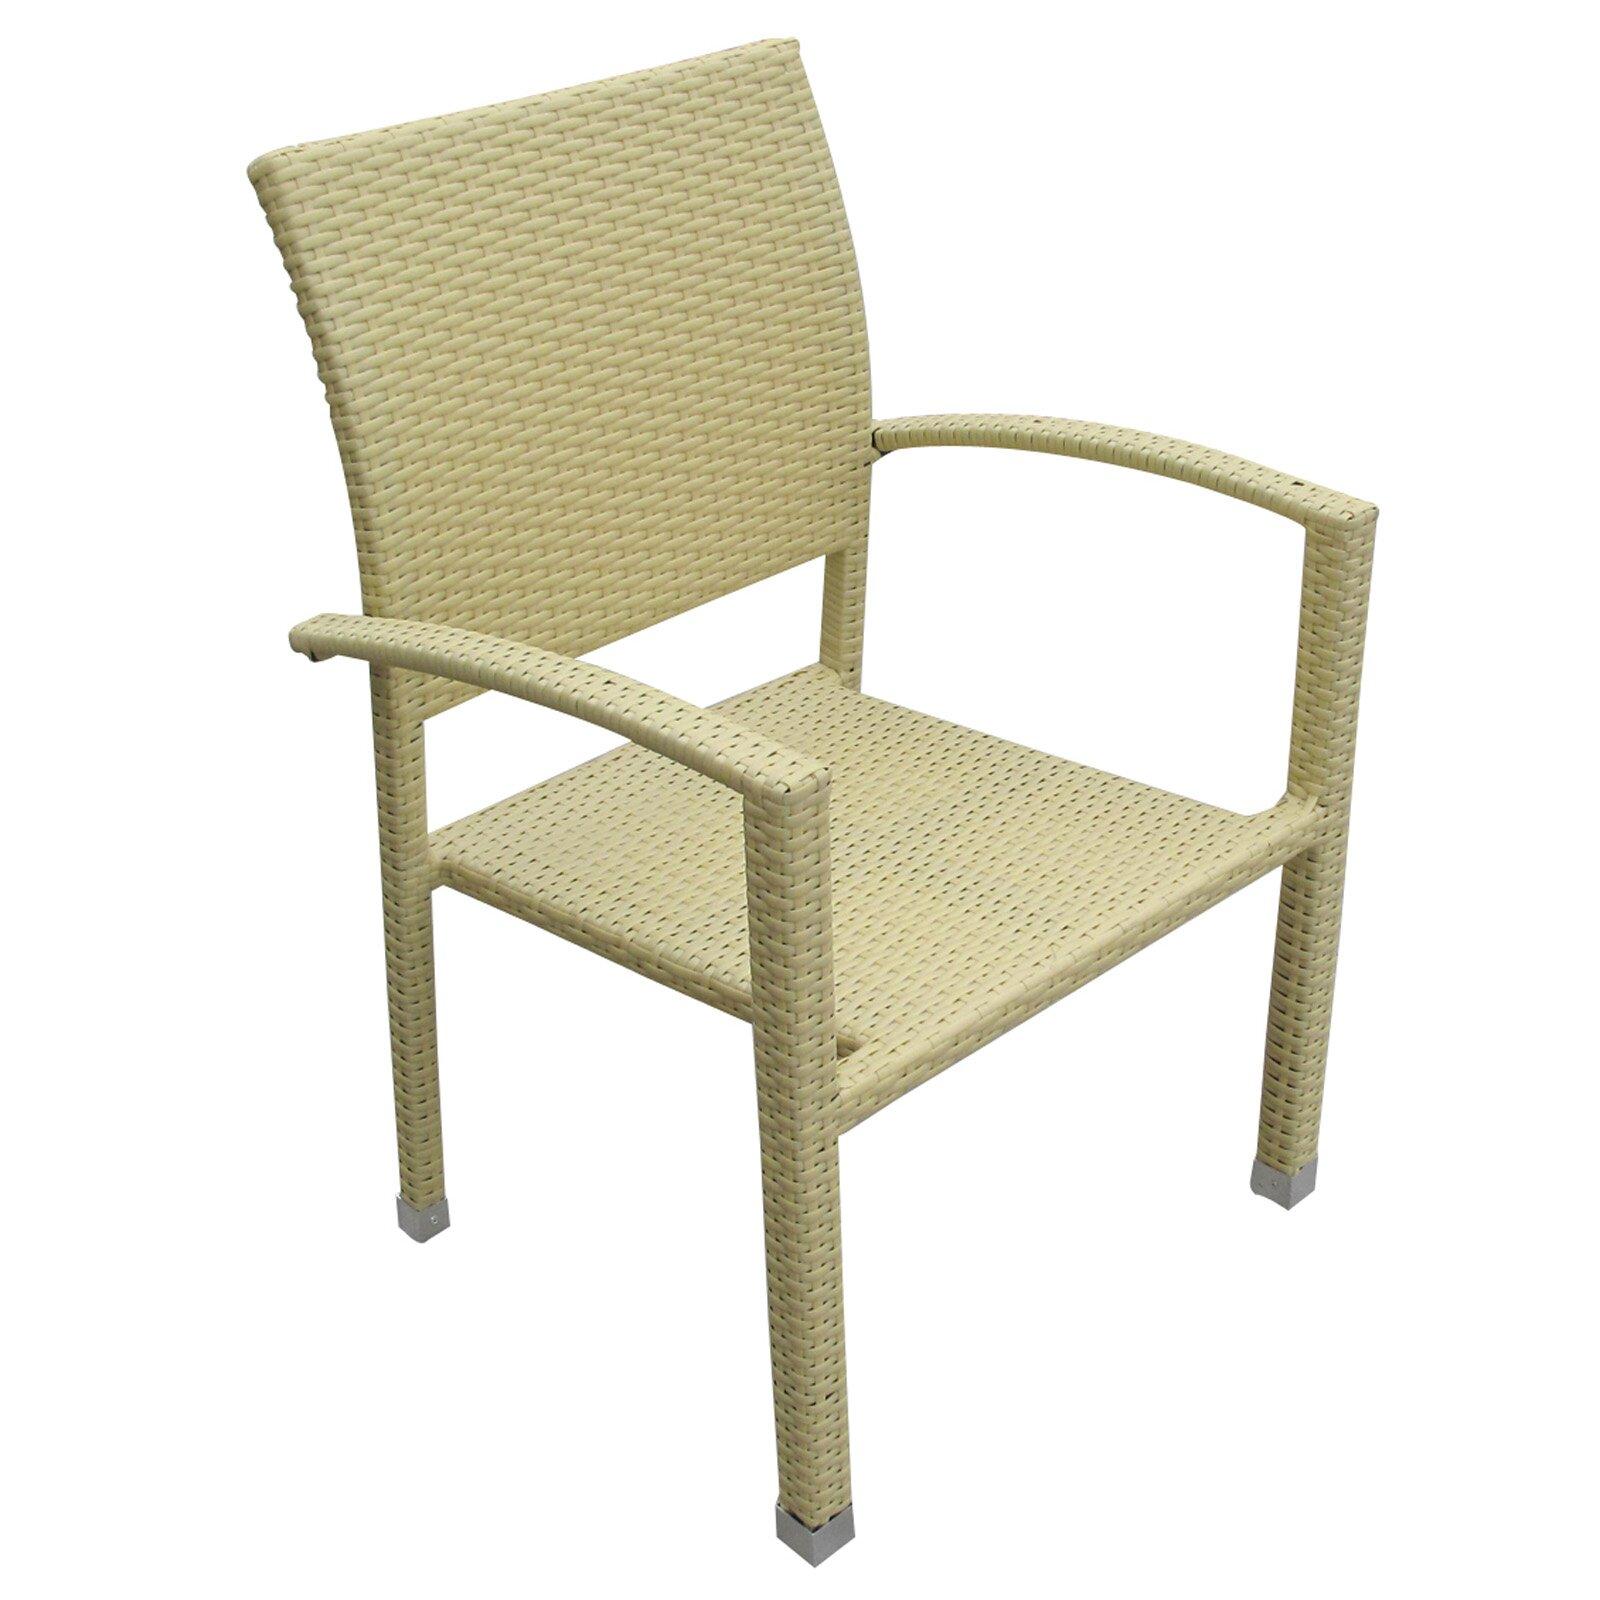 Http Www Wayfair Com Modway Tova Patio Chairs Setof 4 Wq9739 Fow1293 Html